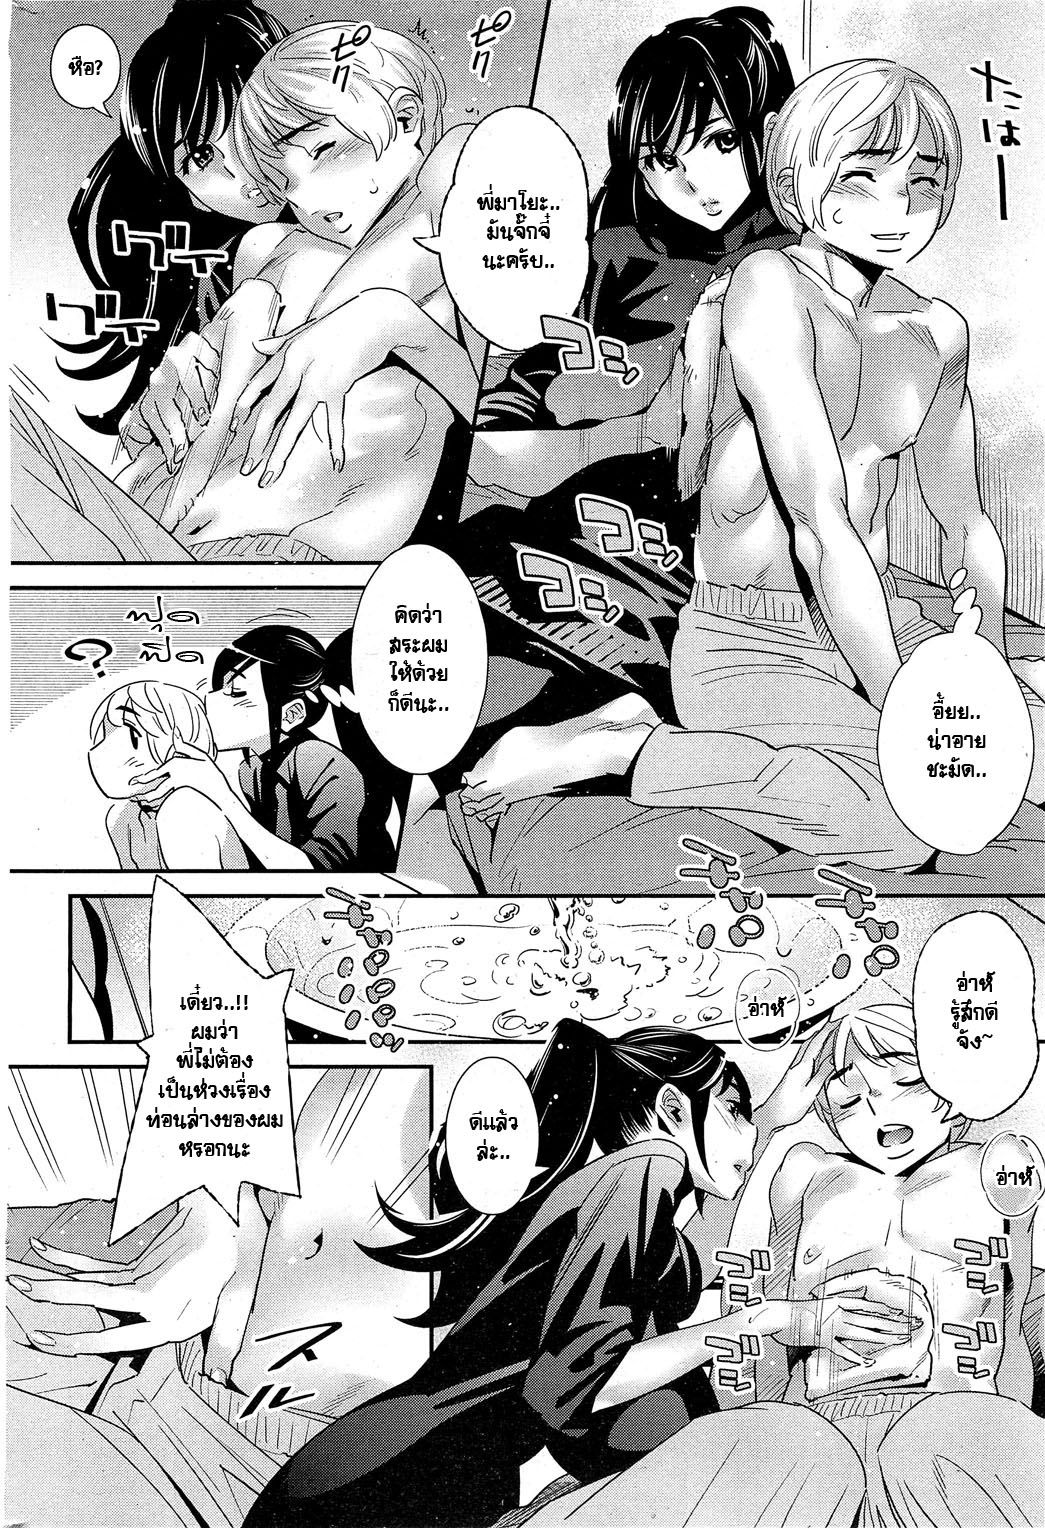 The Ghost Behind My BackLovesick Winter (Comic Hotmilk 201303) | การ์ตูน Doujin Manga แปลไทยล้วนๆ  XONLY4